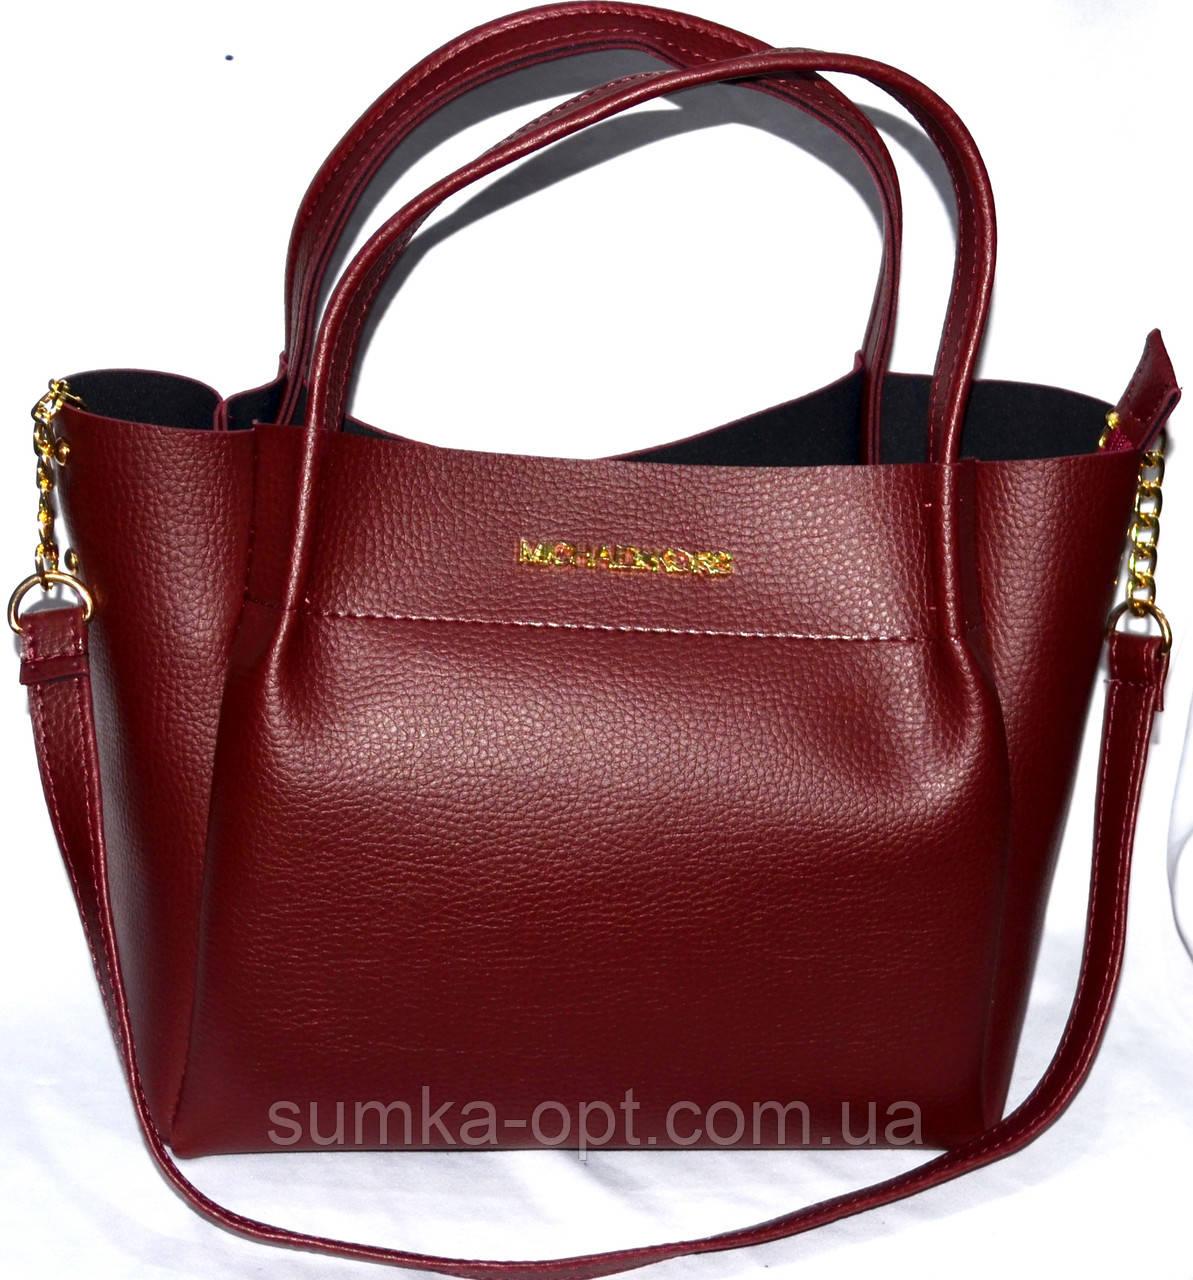 Женские брендовые сумки Michel Kors (бордо)25 27см  продажа, цена в ... 7f0d8167776